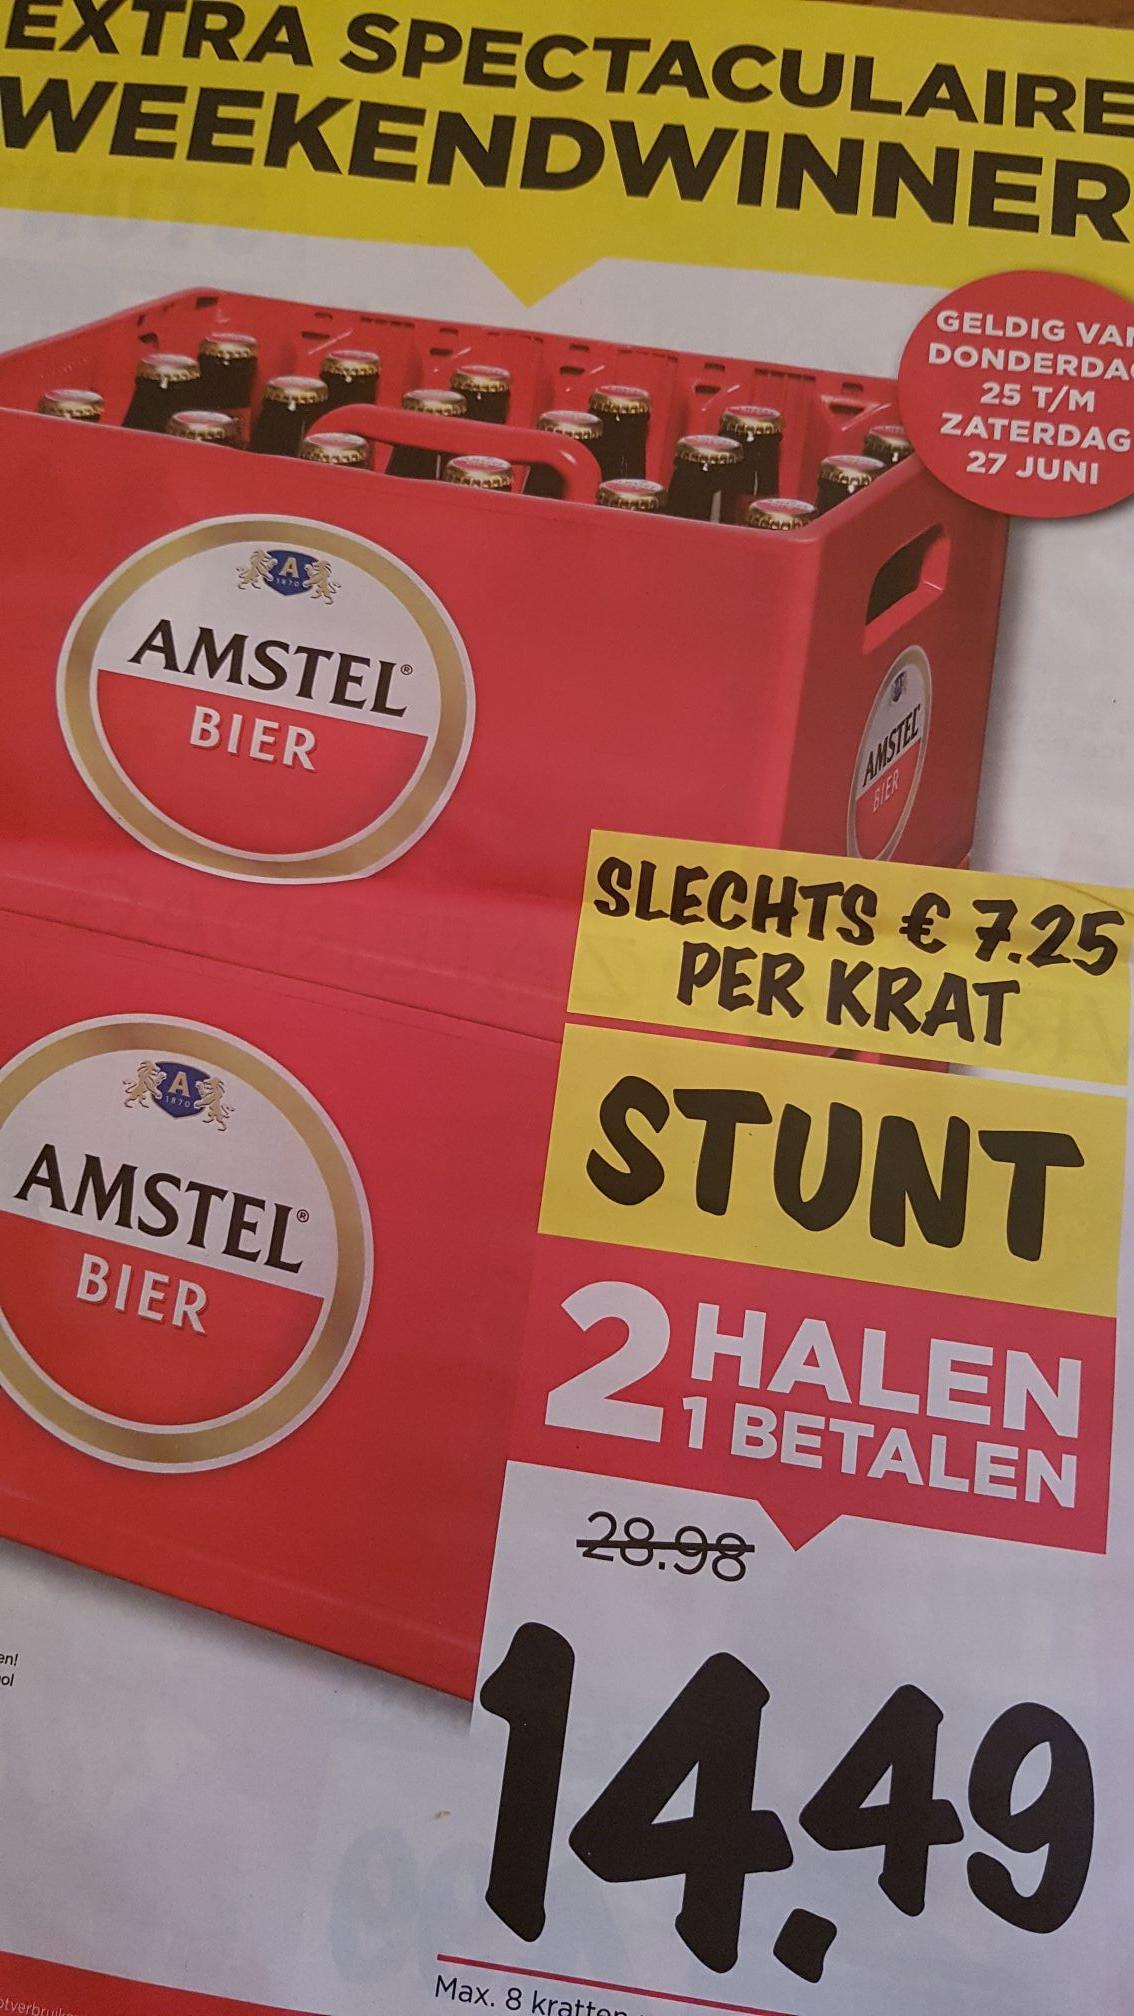 Amstel Krat 1+1 gratis @Vomar